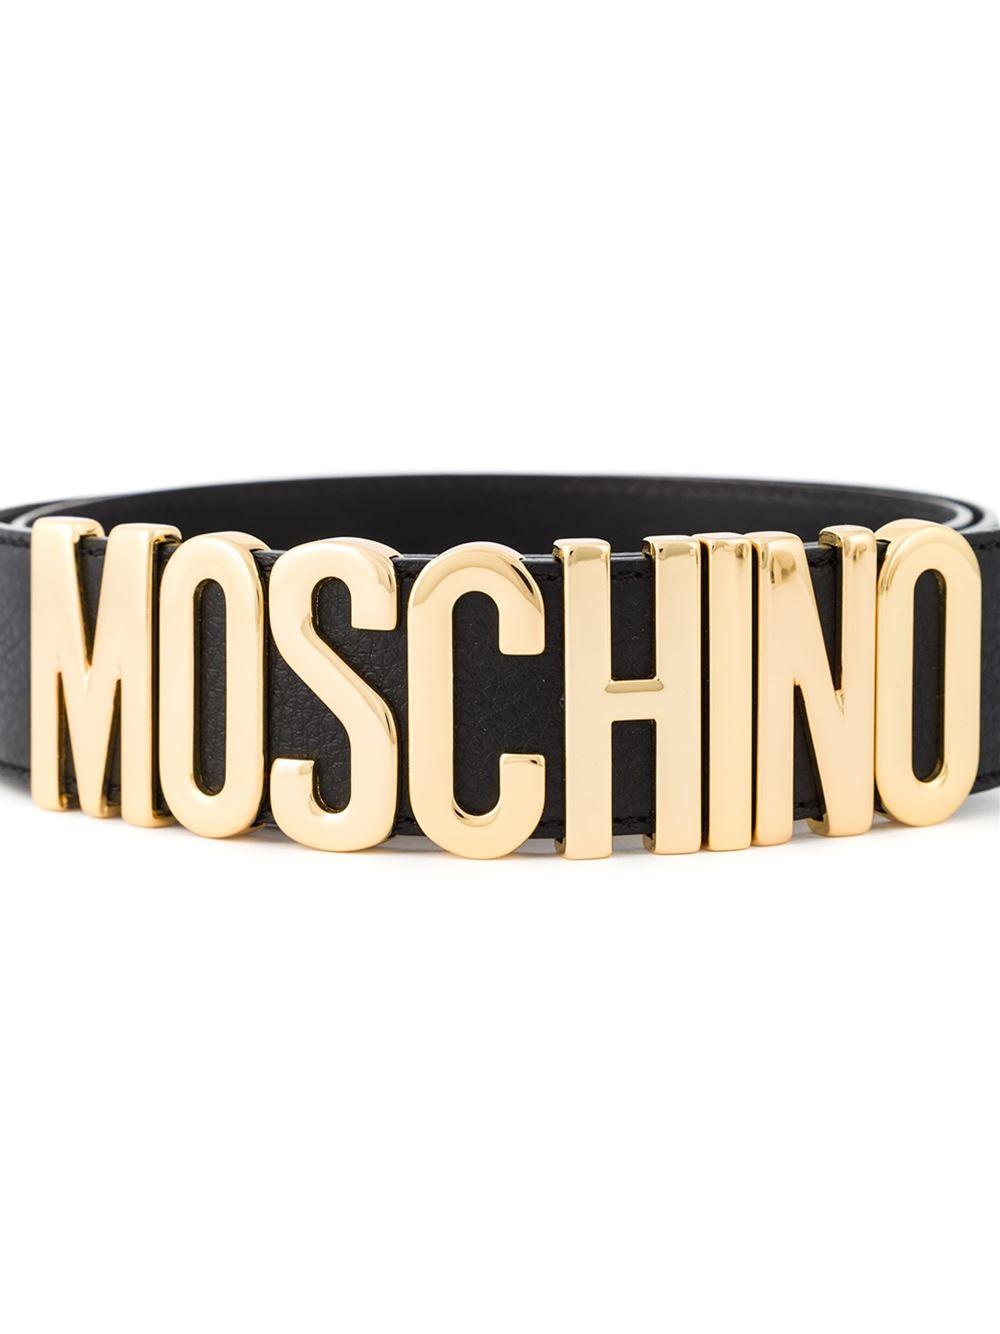 022fe58c66 Moschino Logo Plaque Belt in Gold (black), Lyst